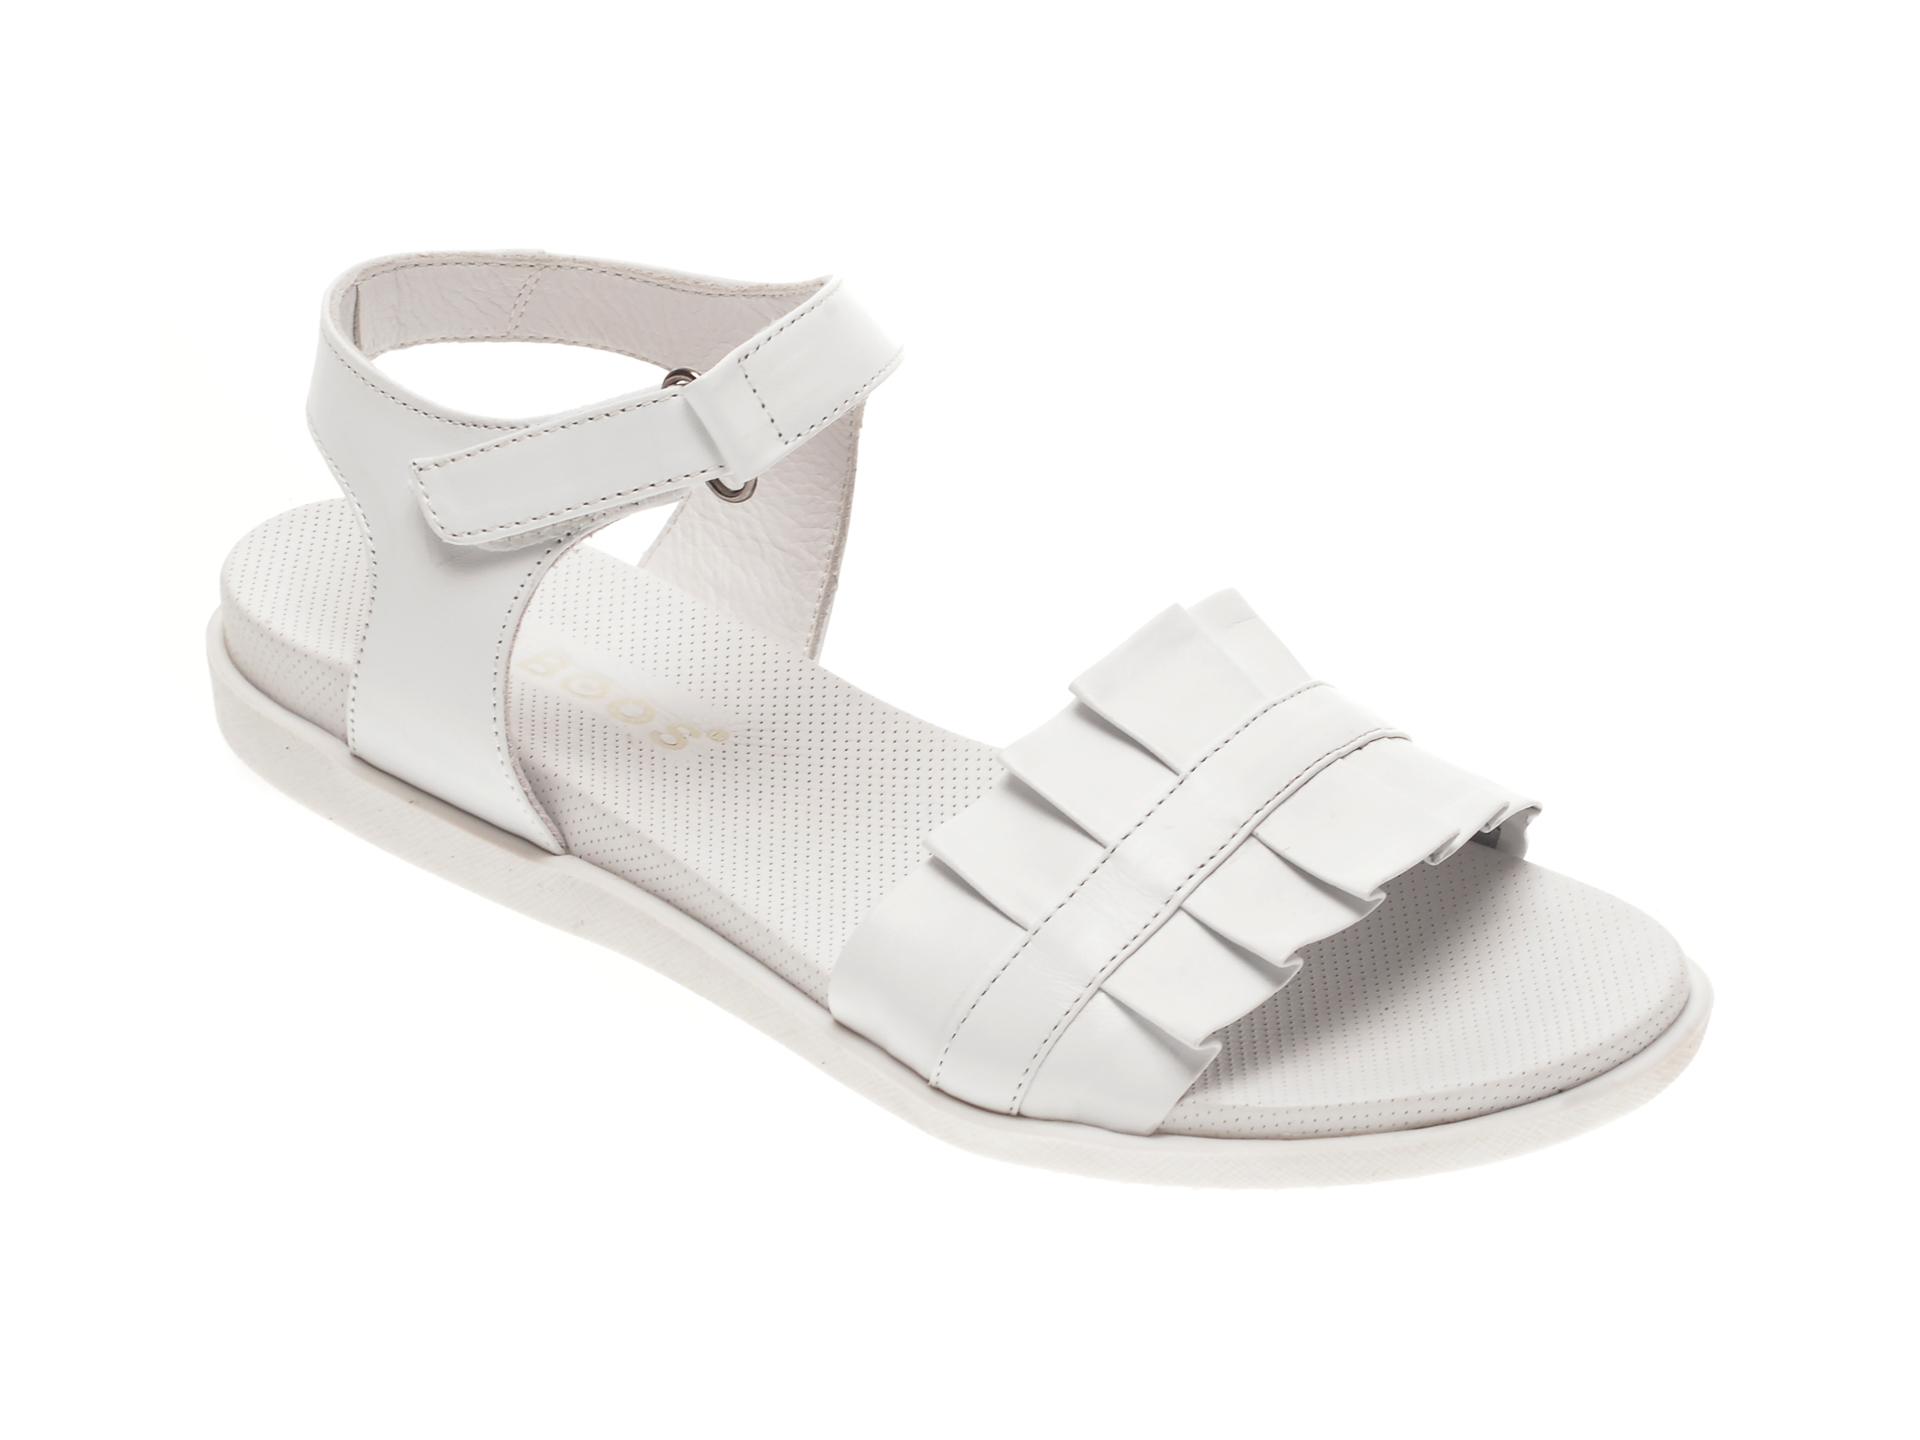 Sandale BABOOS albe, 1403, din piele naturala imagine